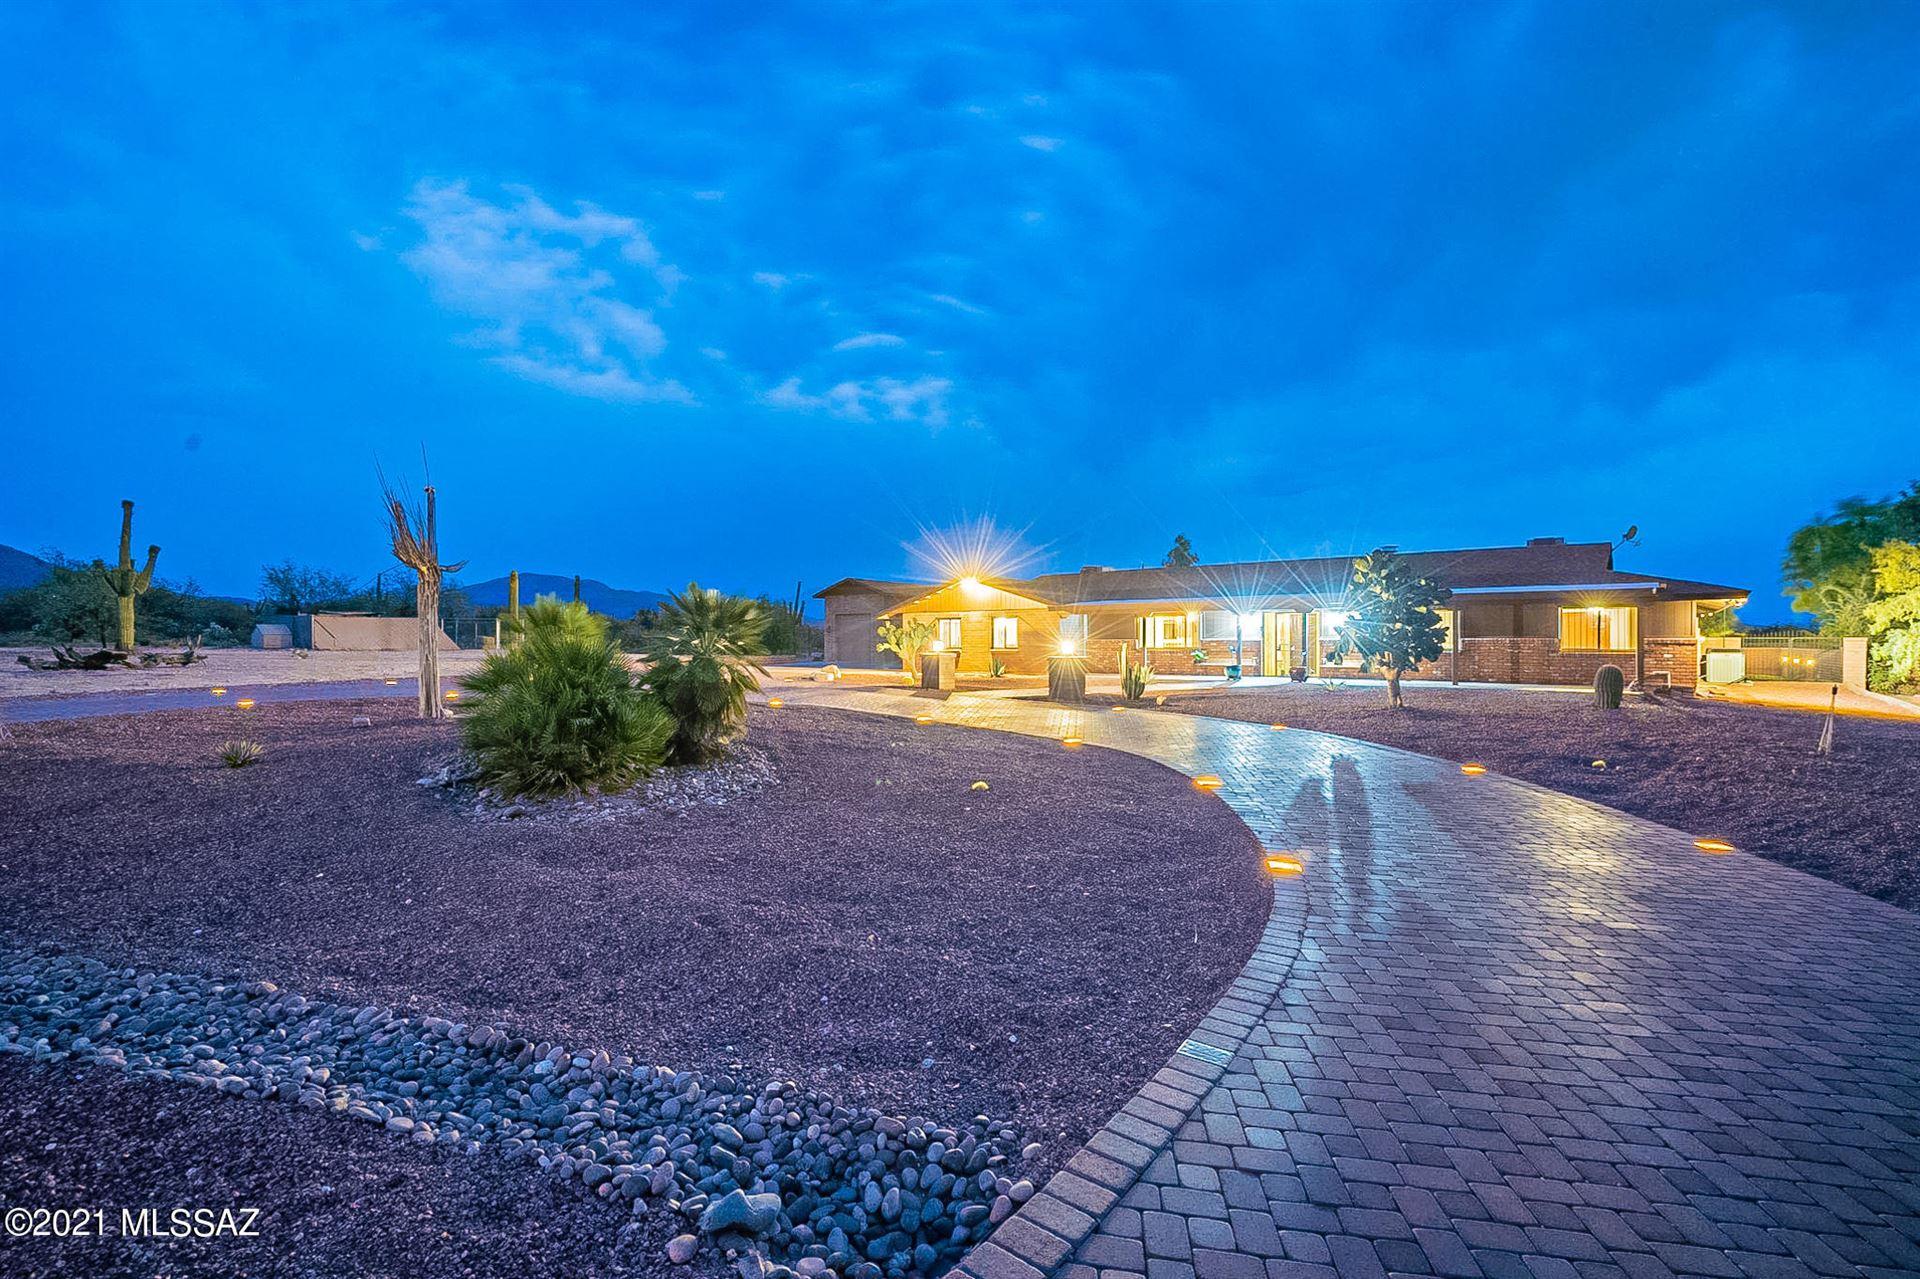 10180 E Cadillac Lane, Tucson, AZ 85749 - MLS#: 22114655